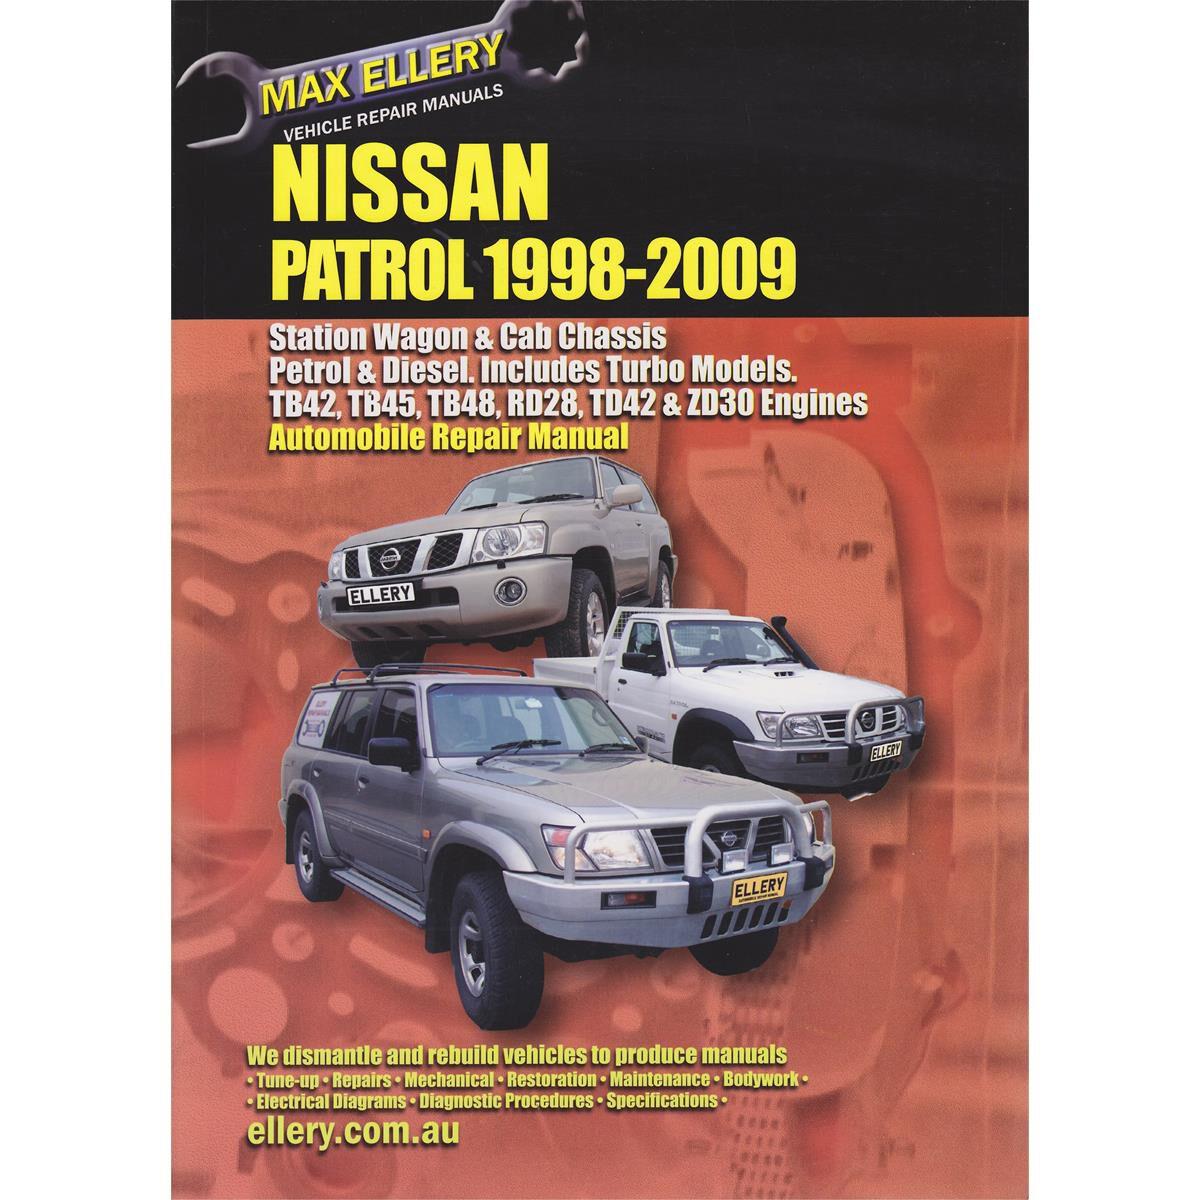 ellery car manual for nissan patrol 1998 2009 ep n158 supercheap rh supercheapauto com au